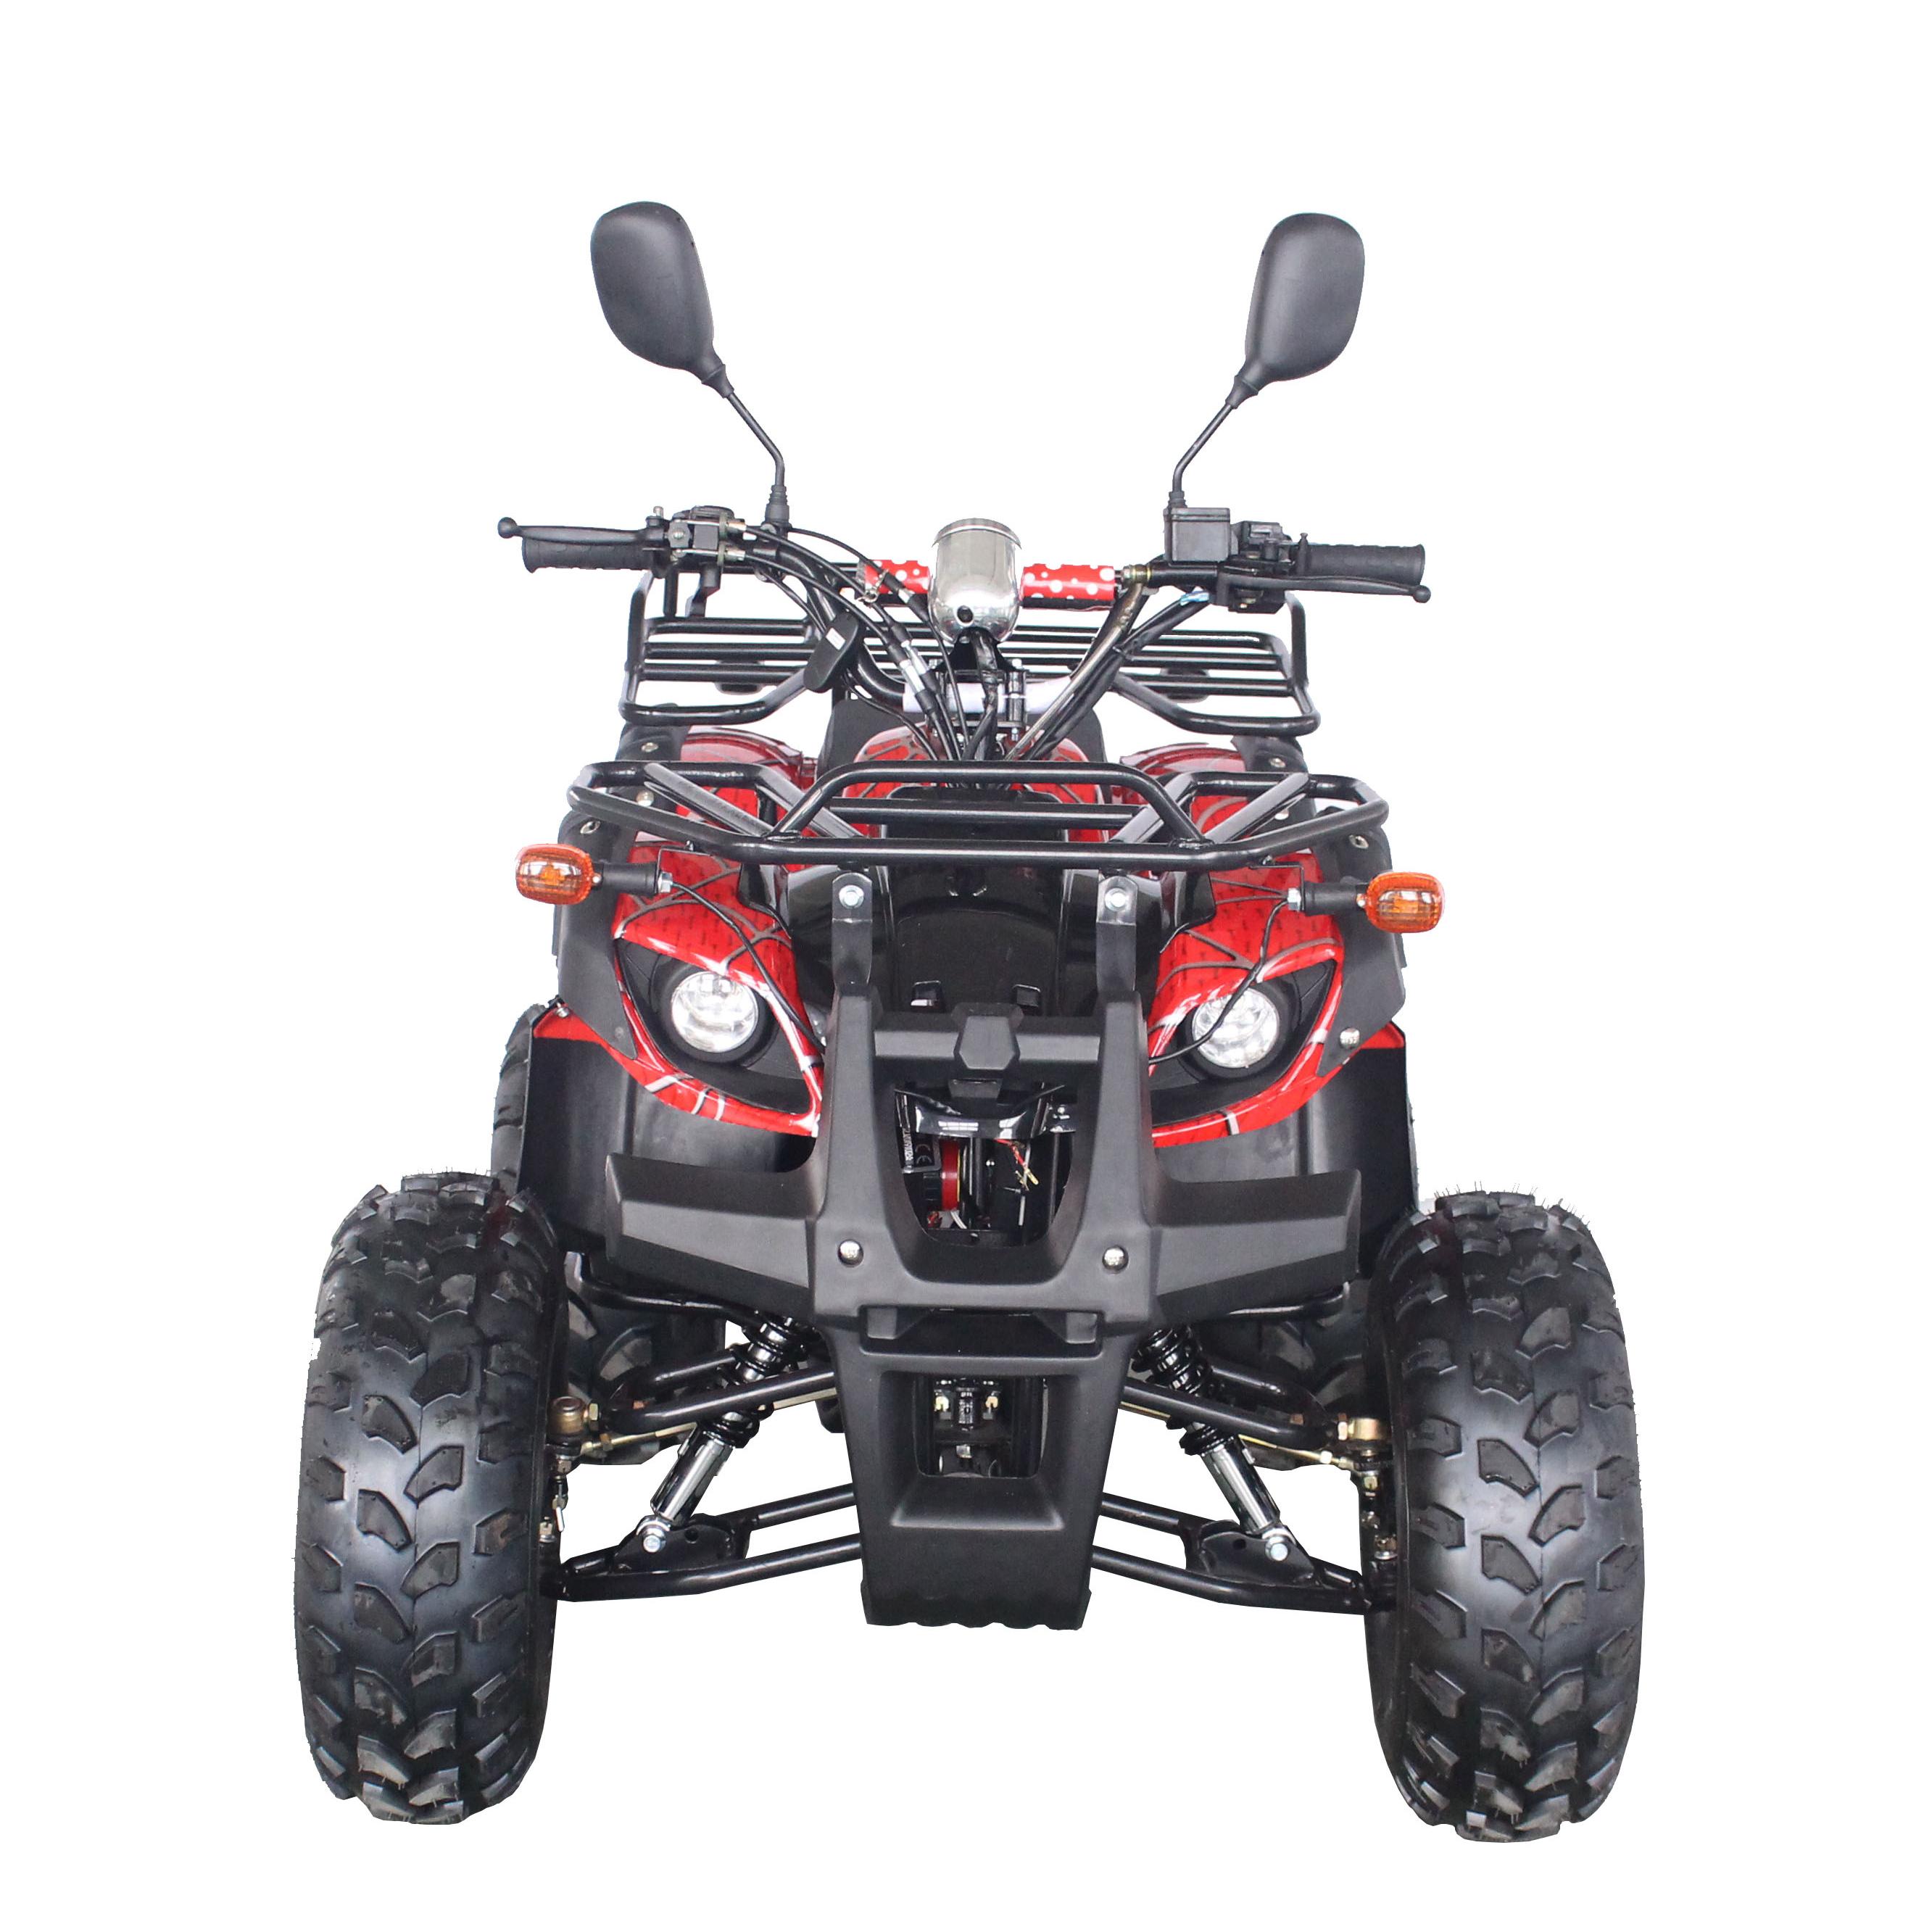 Hot Sell Cheap Polaris Atv Part 125cc For Sale Buy Atv Polaris Atv 125cc Atv Part Product On Alibaba Com